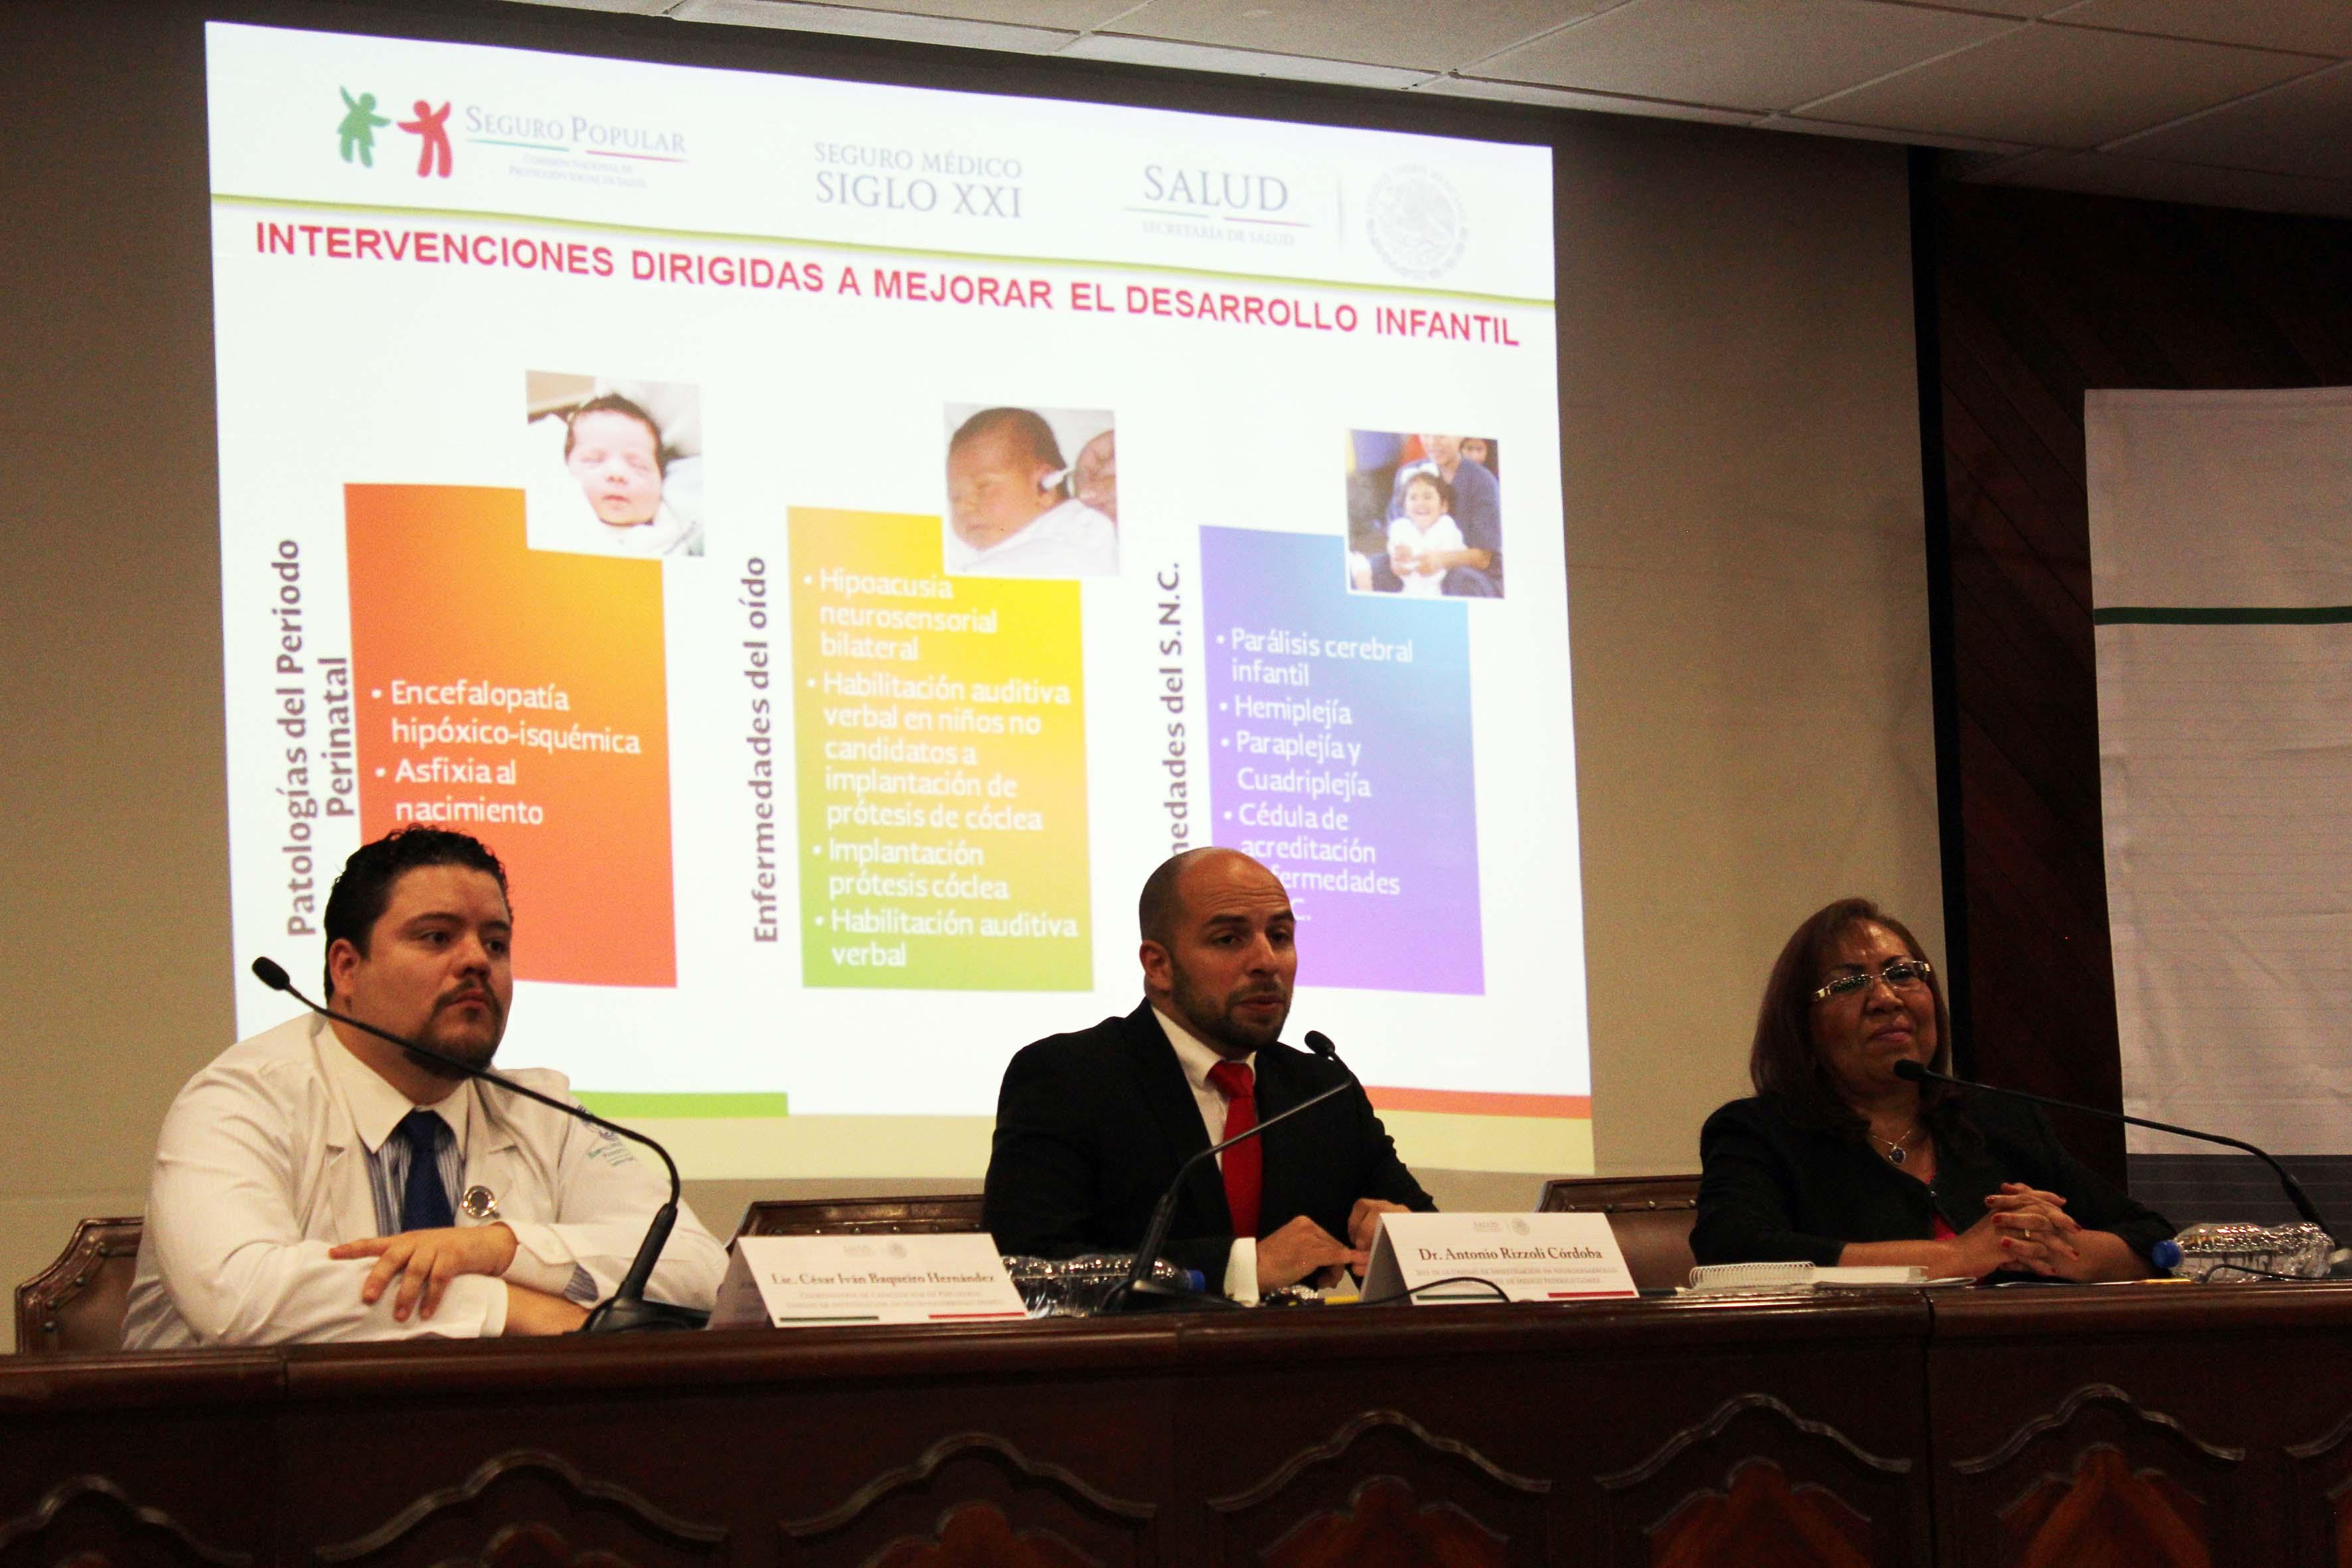 COnferencia de prensa sobre problemas de neurodesarrollo